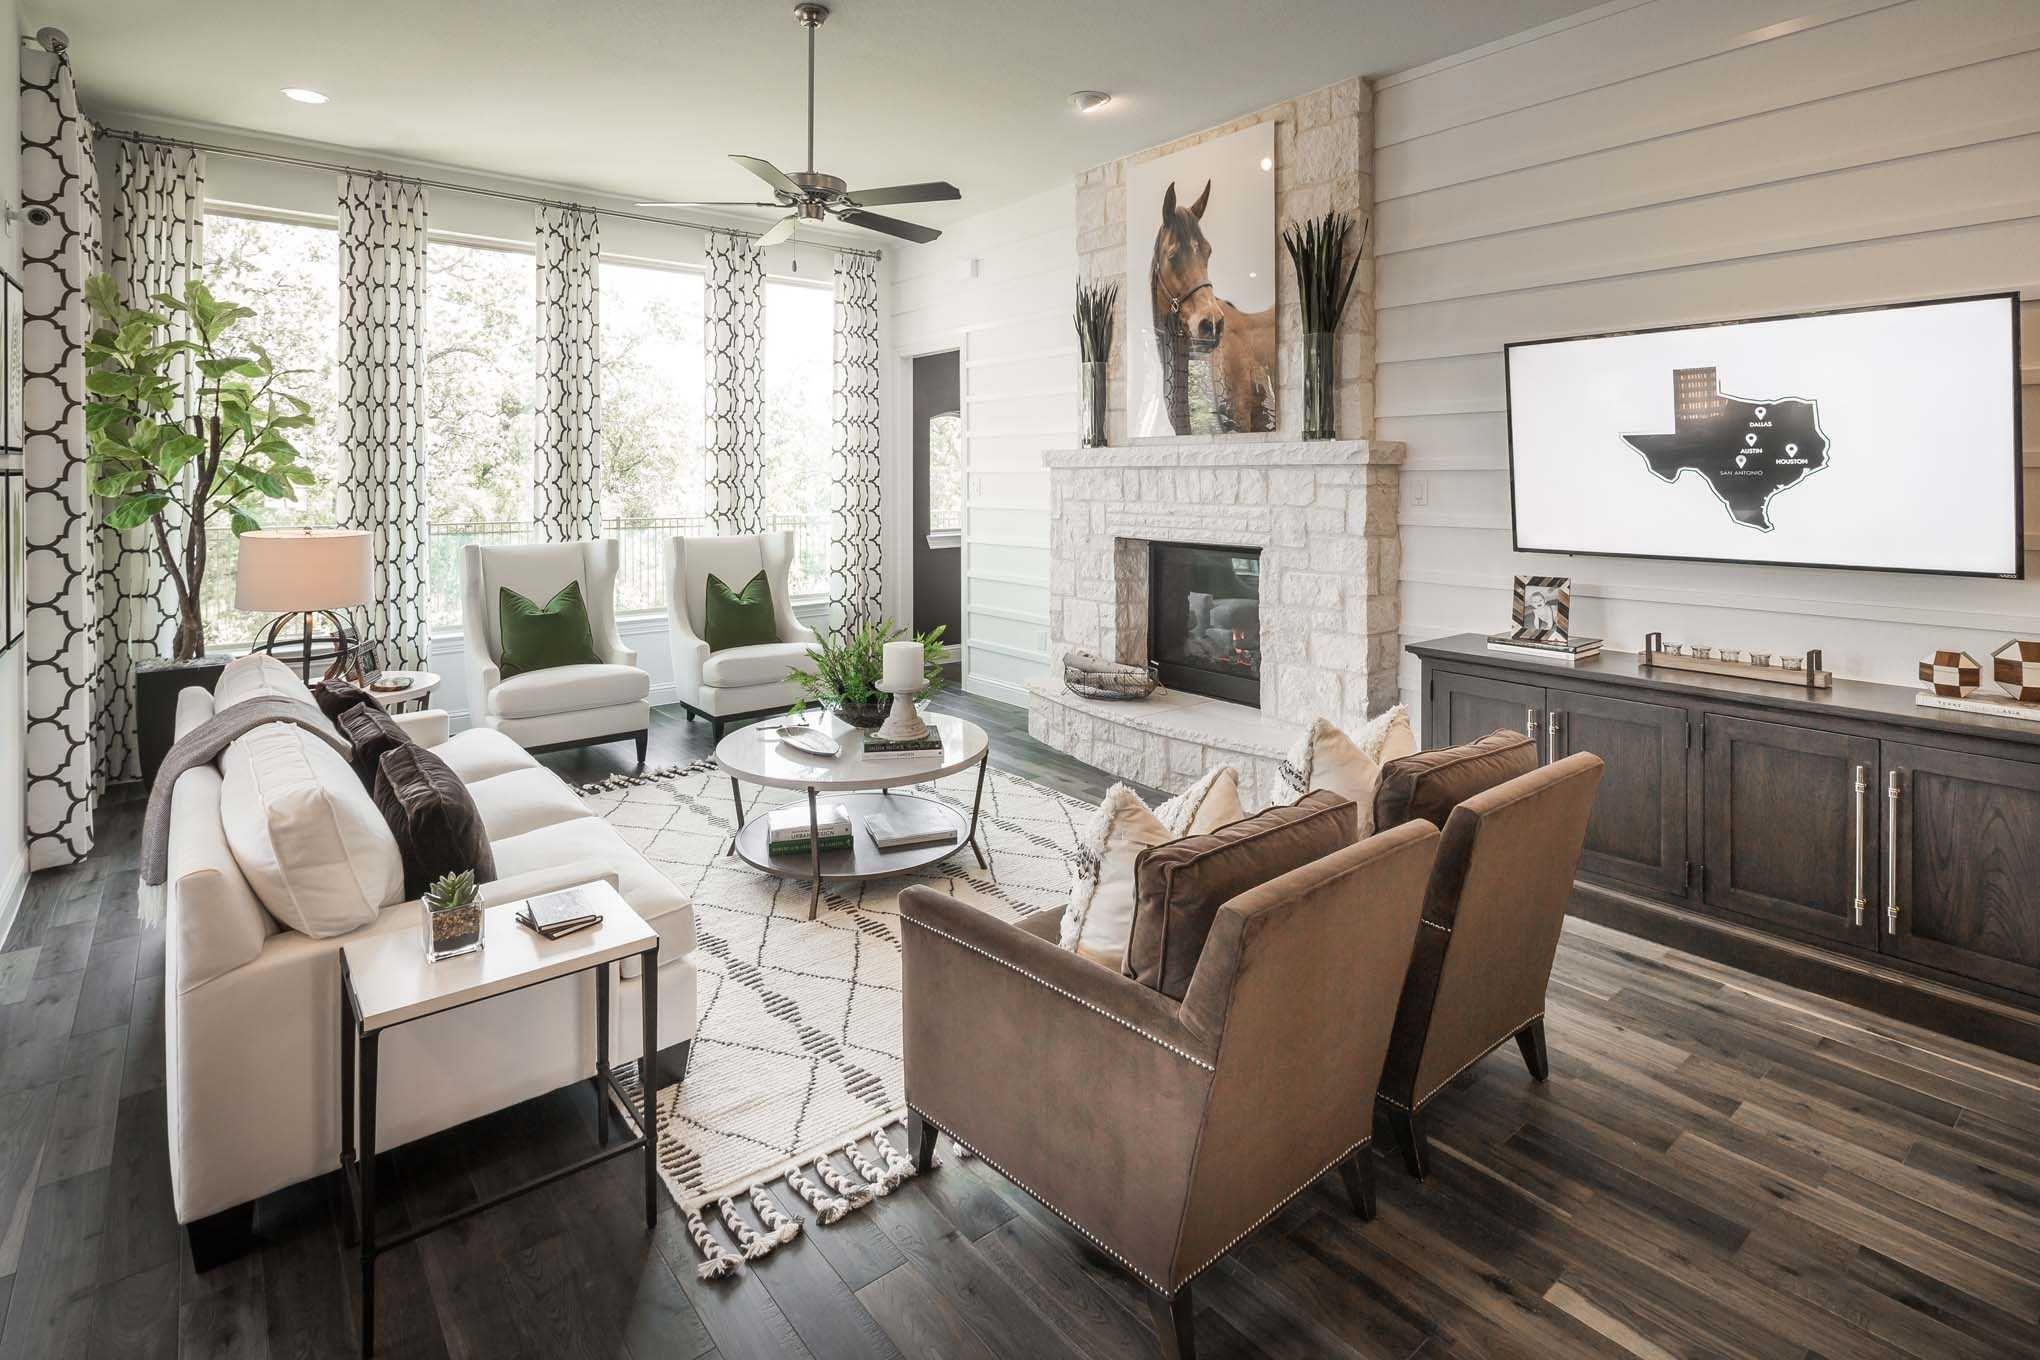 Highland Homes Plan 242 In Lantana Texas At Lantana Barrington 60s Community Familyroom Livingroom Home Color Palette Living Room New Home Builders